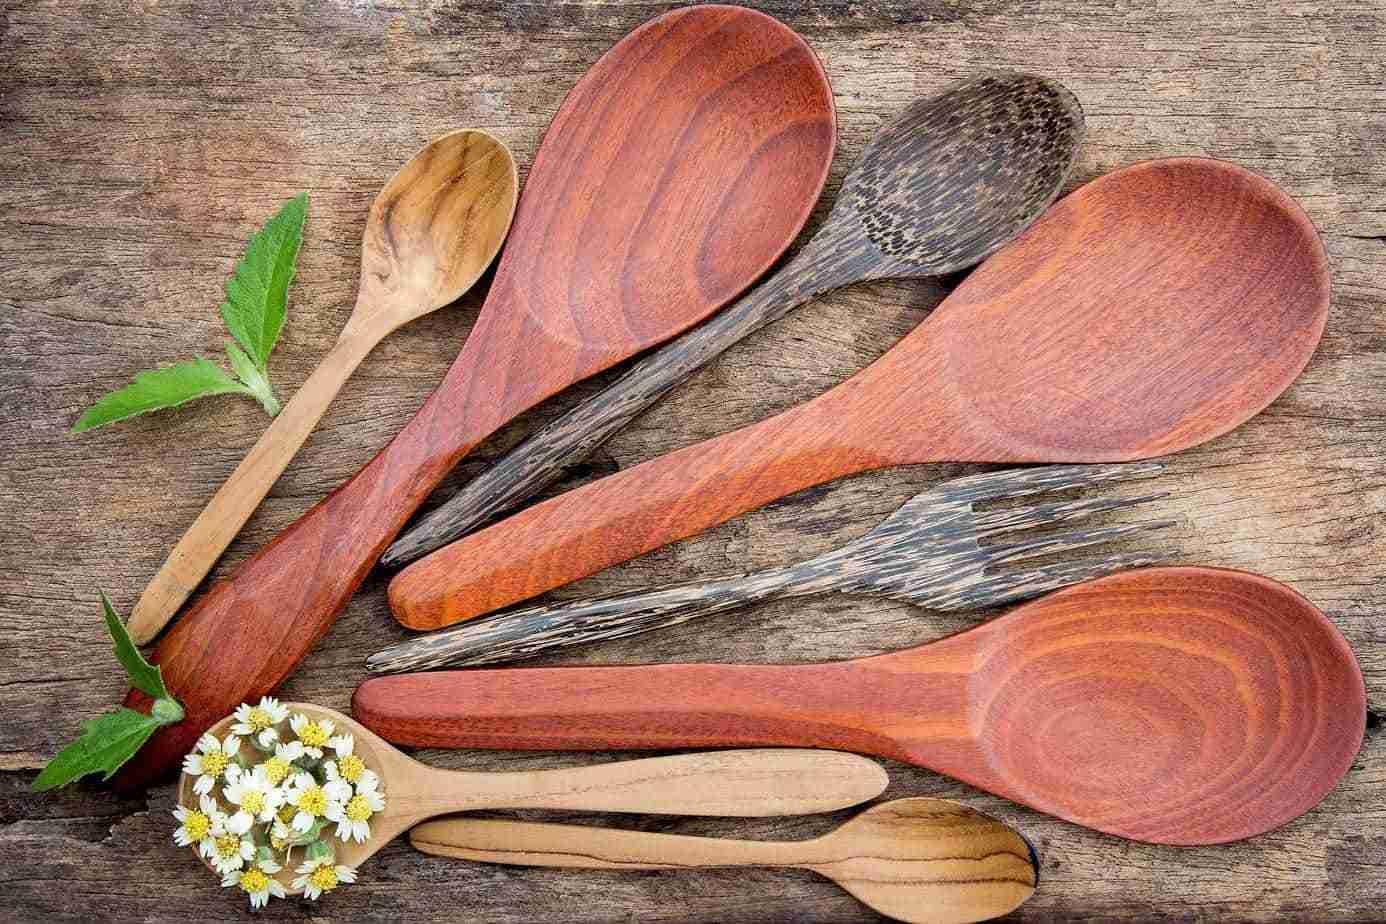 Mestoli-in-cucina-guida-all-uso